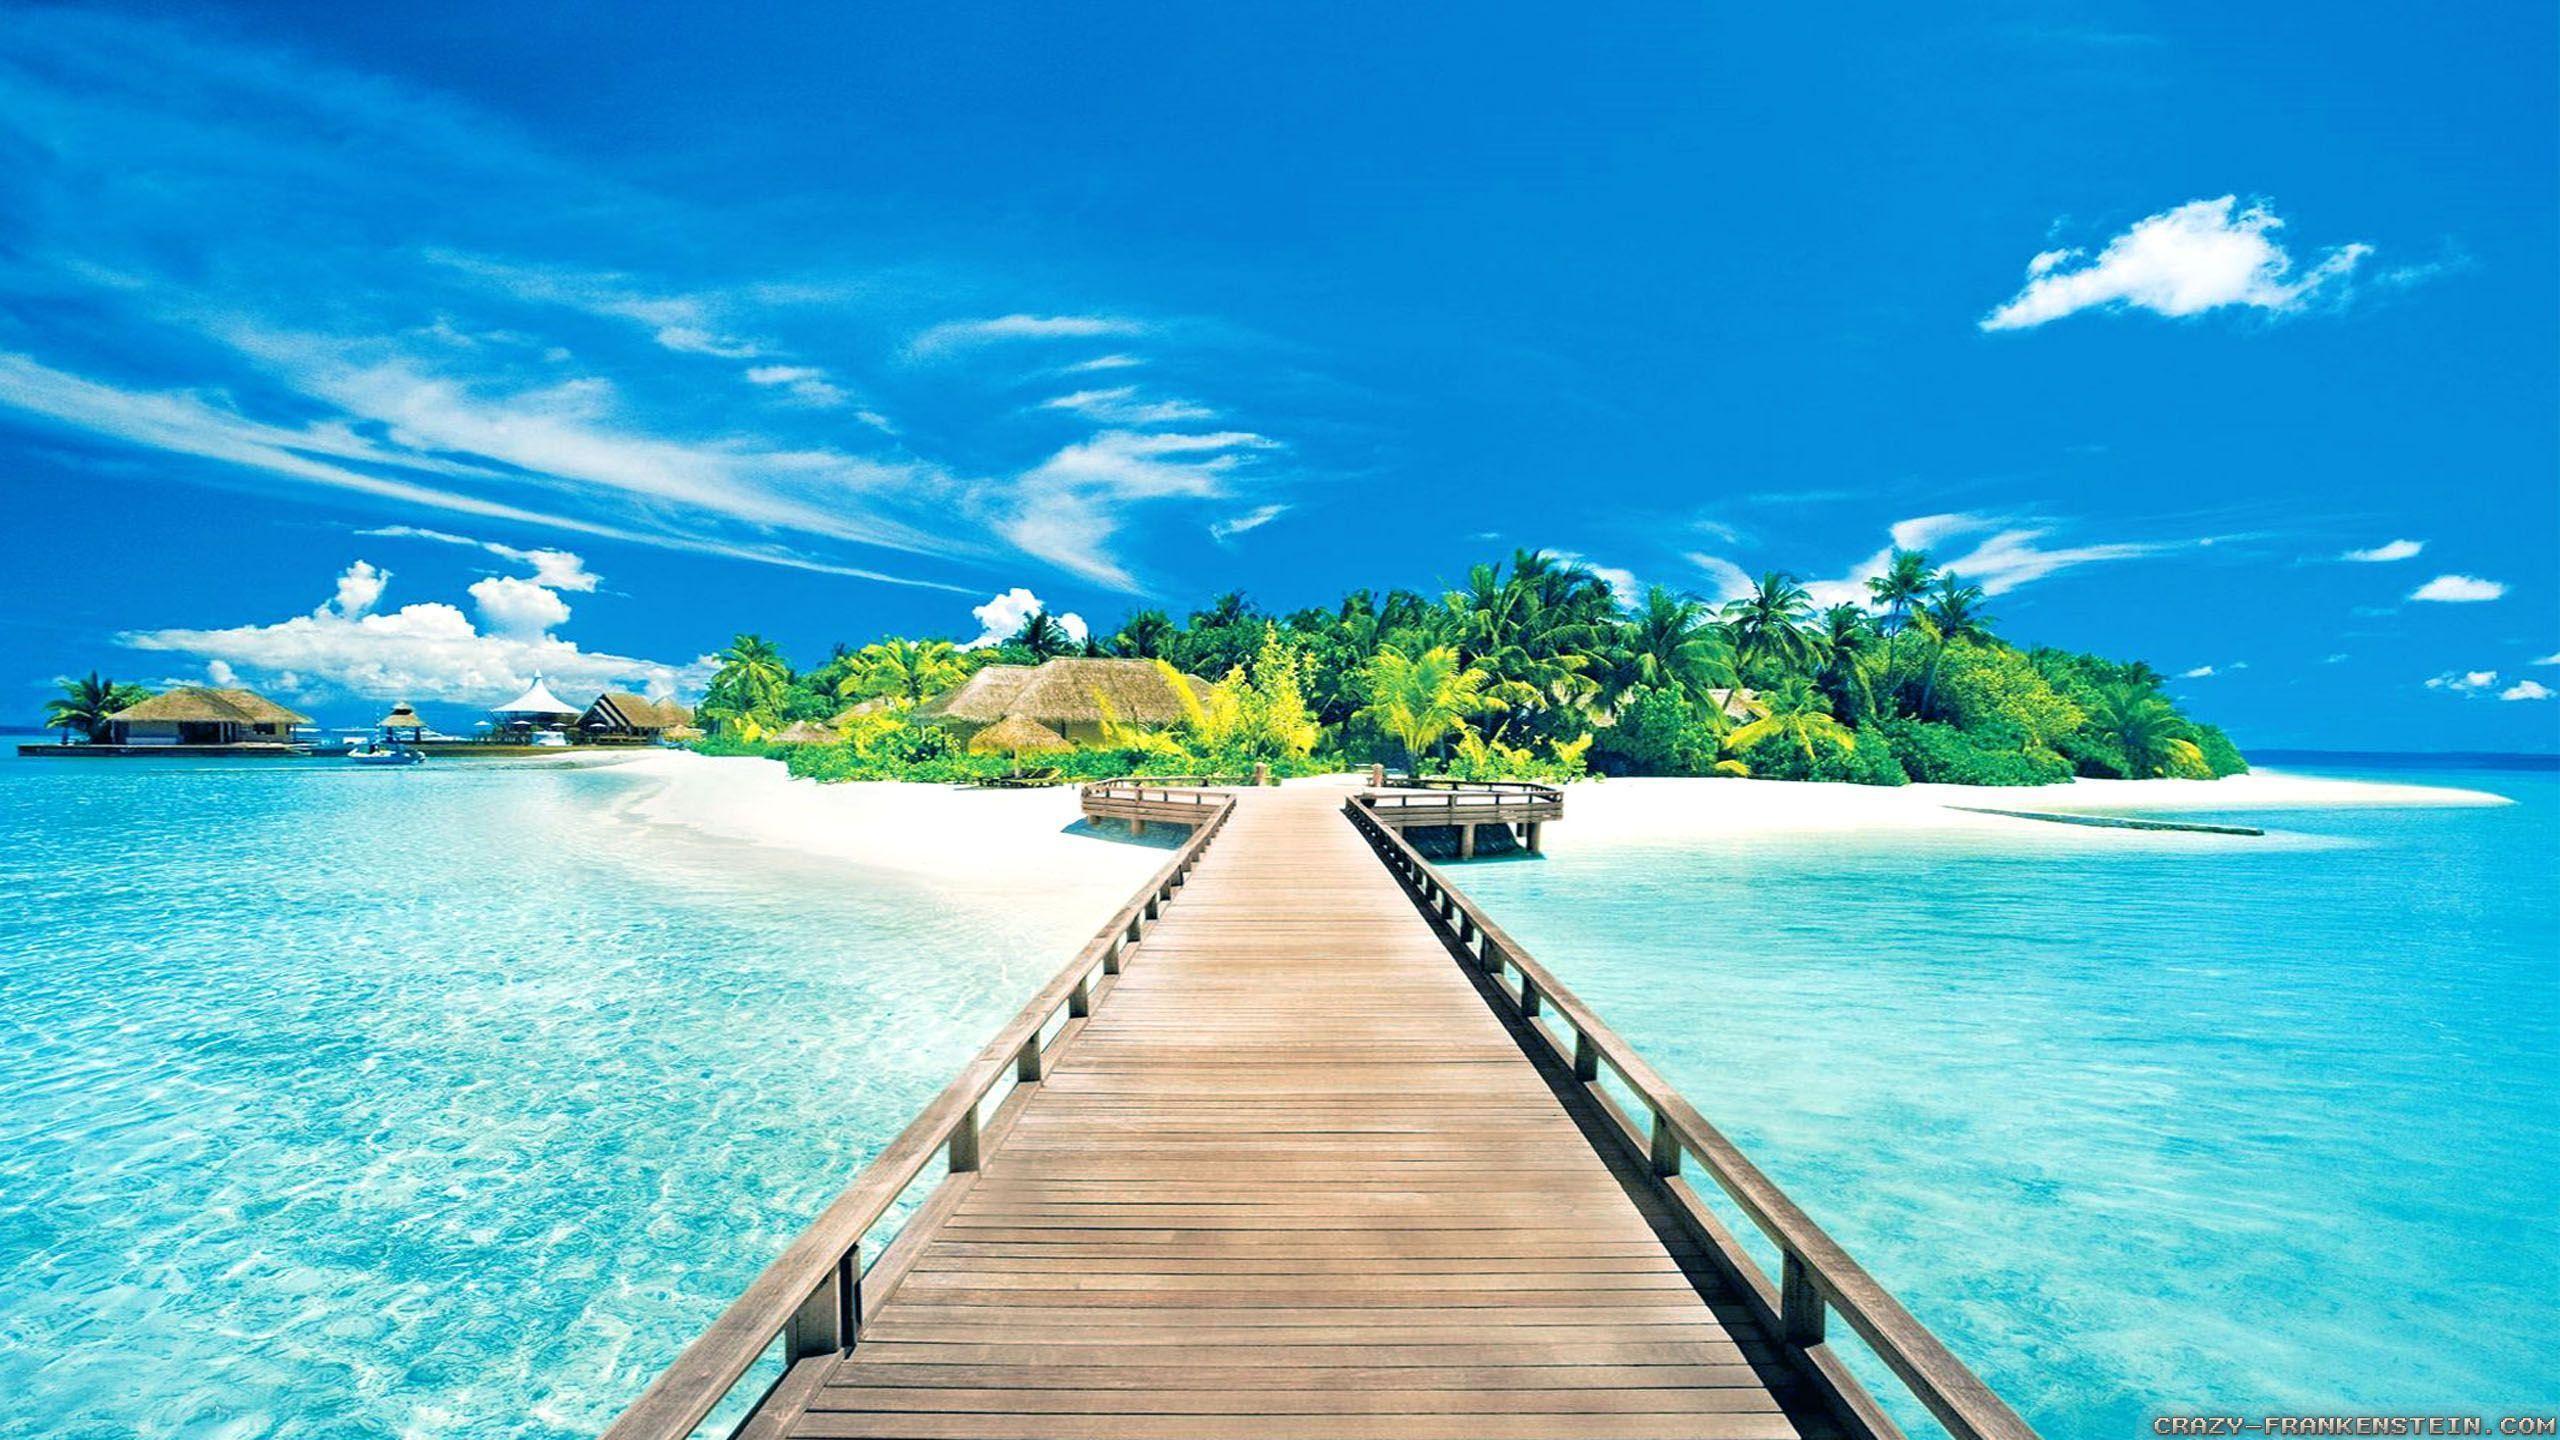 Summer Beach Wallpapers 44 - Get HD Wallpapers Free